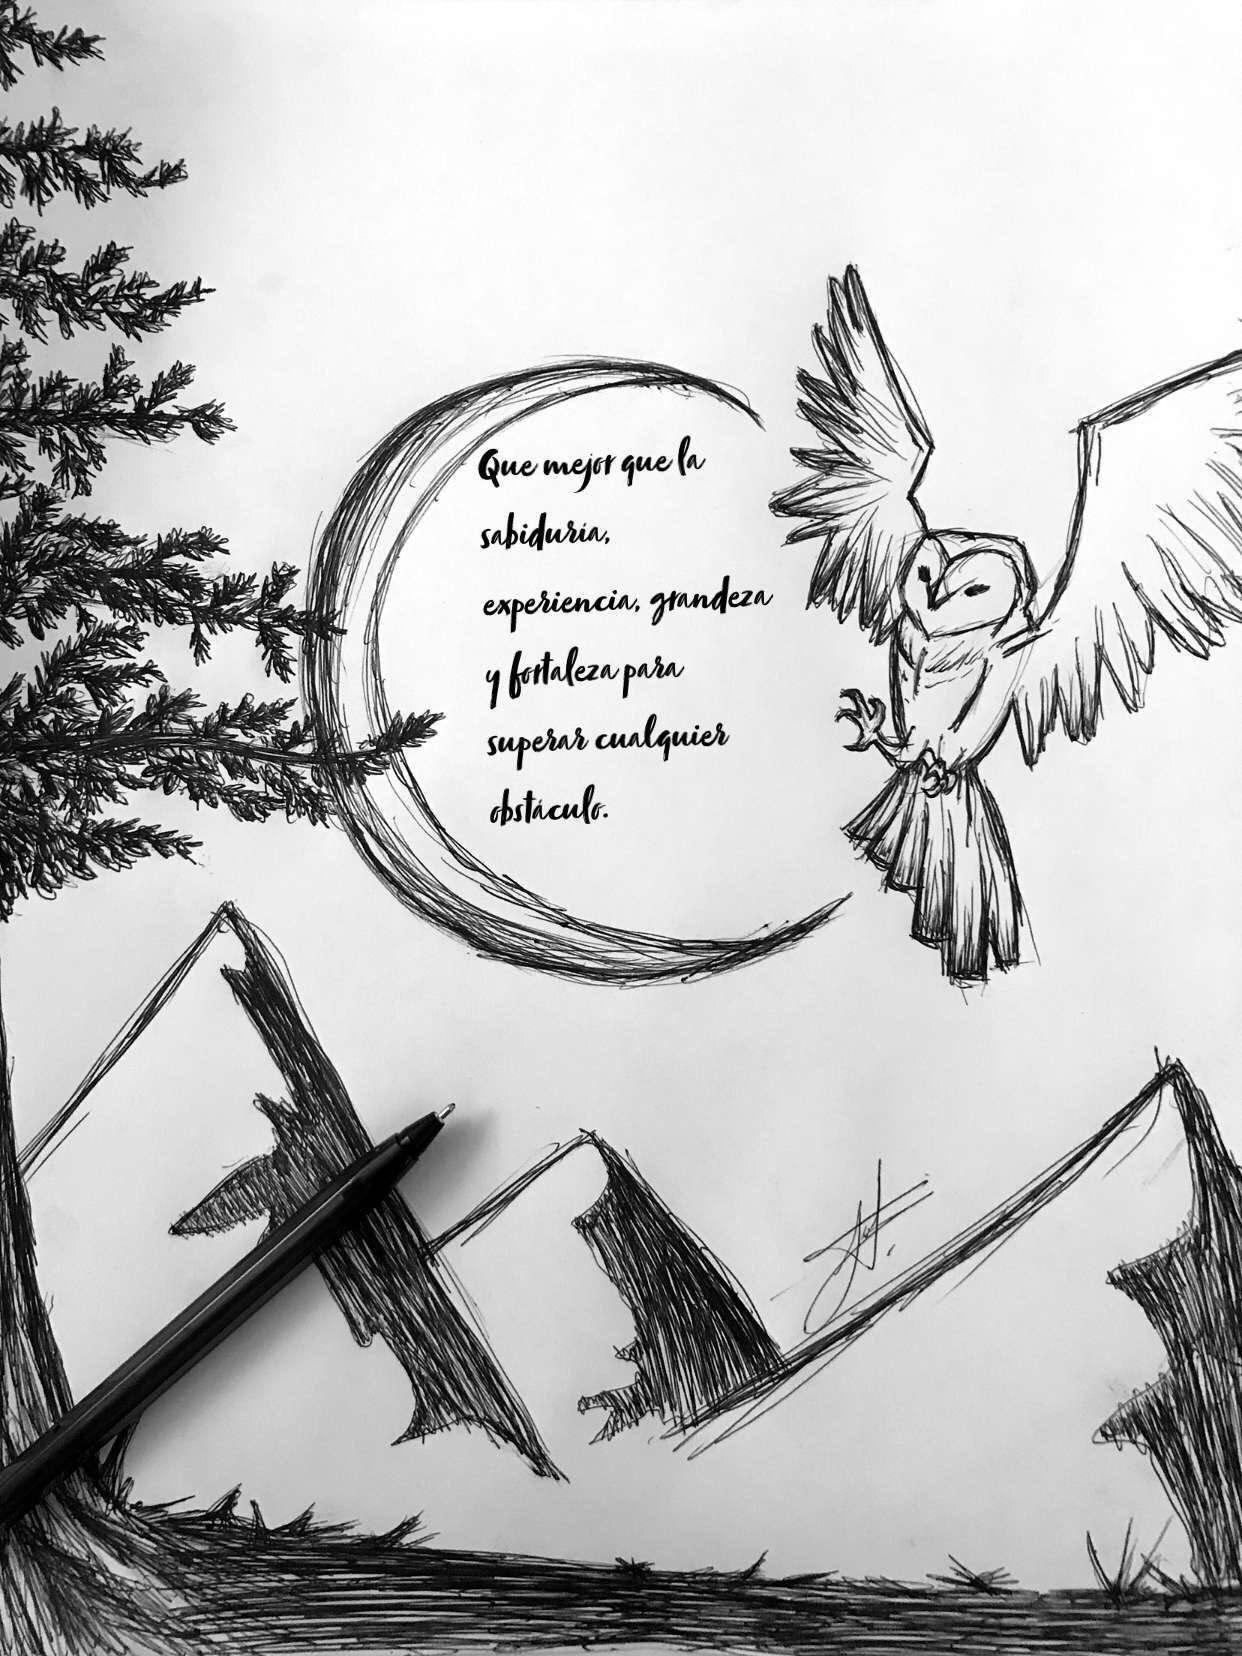 Experiencia Grandeza Fortaleza Y Sabiduria Chica Tumblr Dibujo Lisa Blackpink Fondo De Pantalla Dibujos